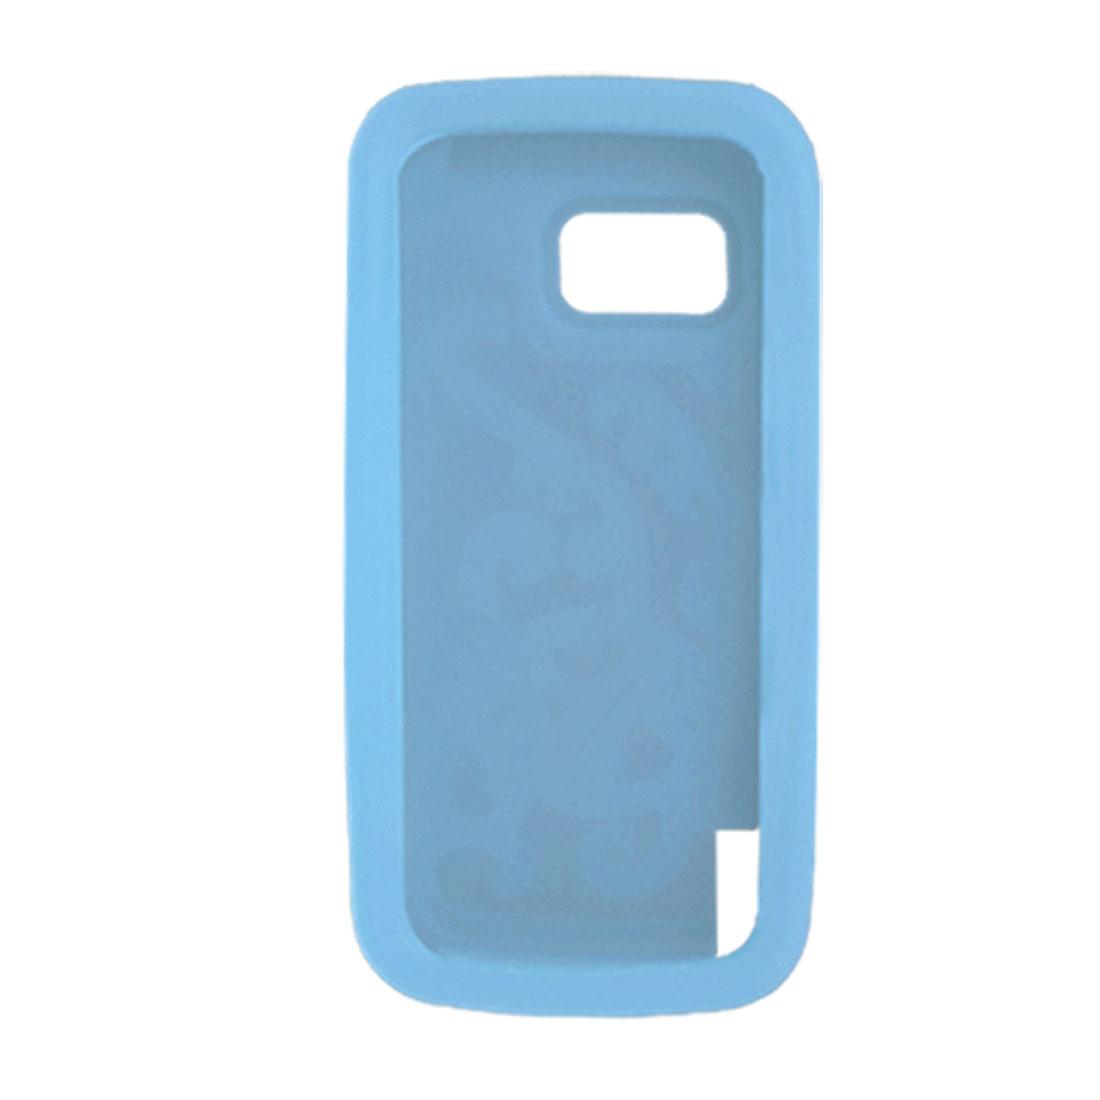 Anti-Slip Soft Silicone Case for Nokia 5800